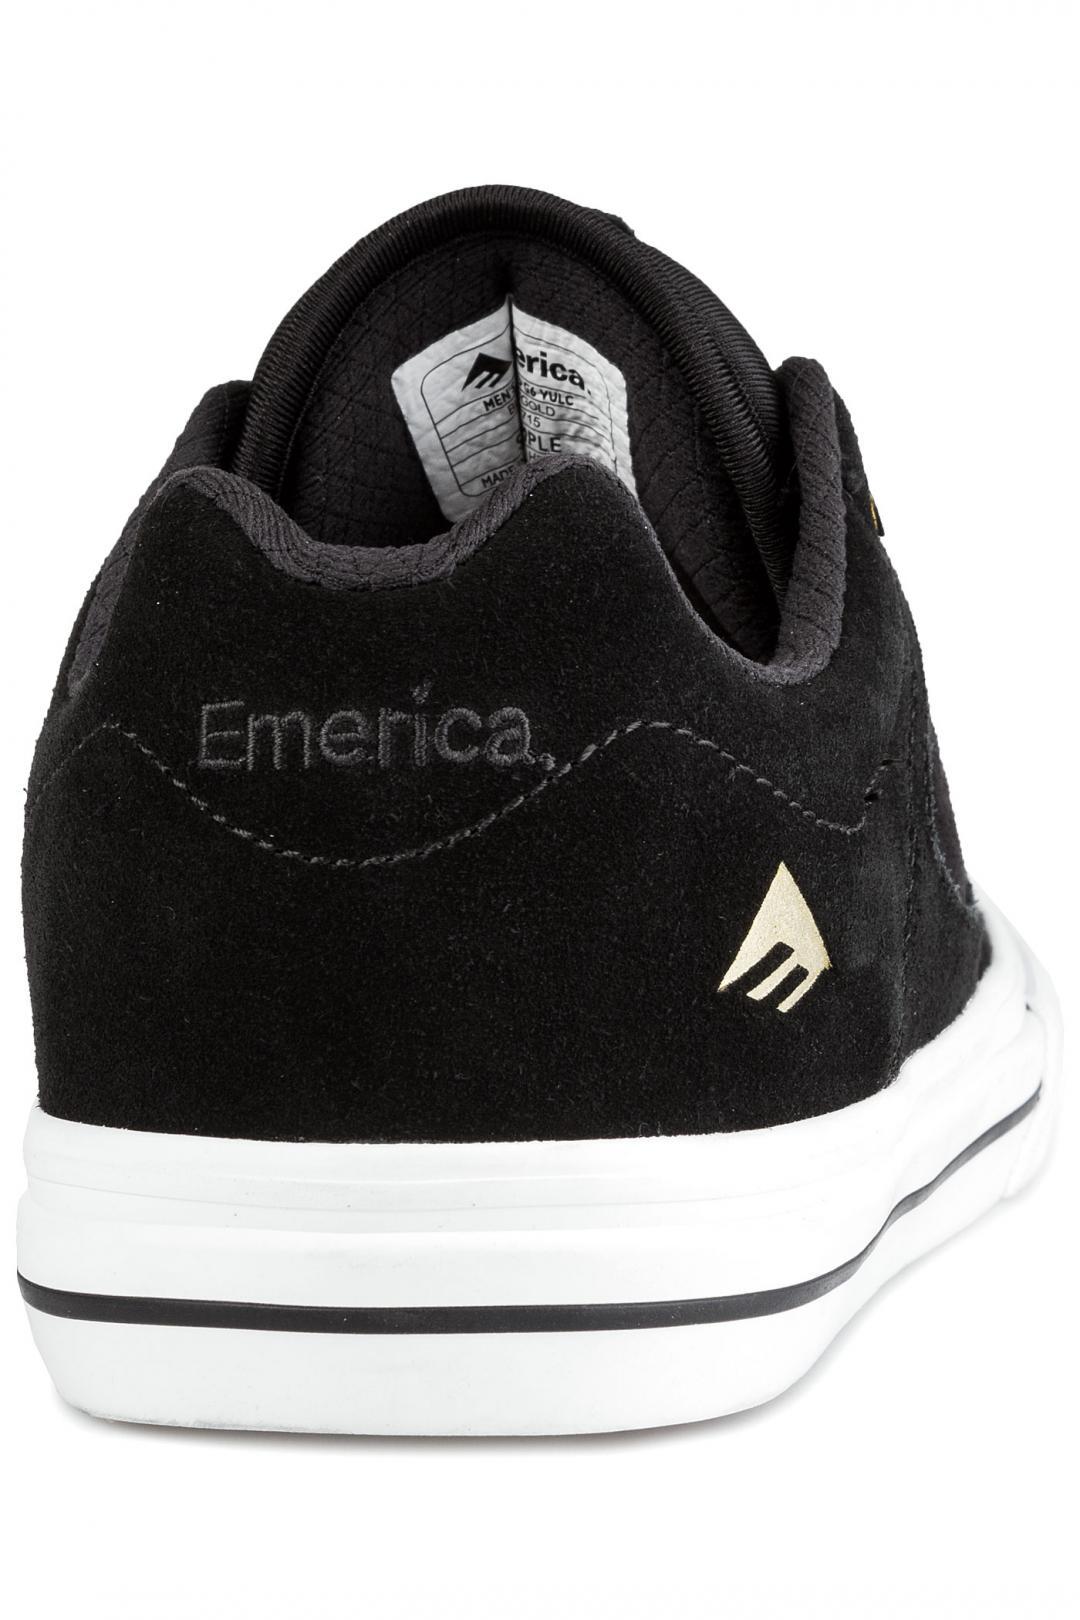 Uomo Emerica Reynolds 3 G6 Vulc black white gold | Scarpe da skate